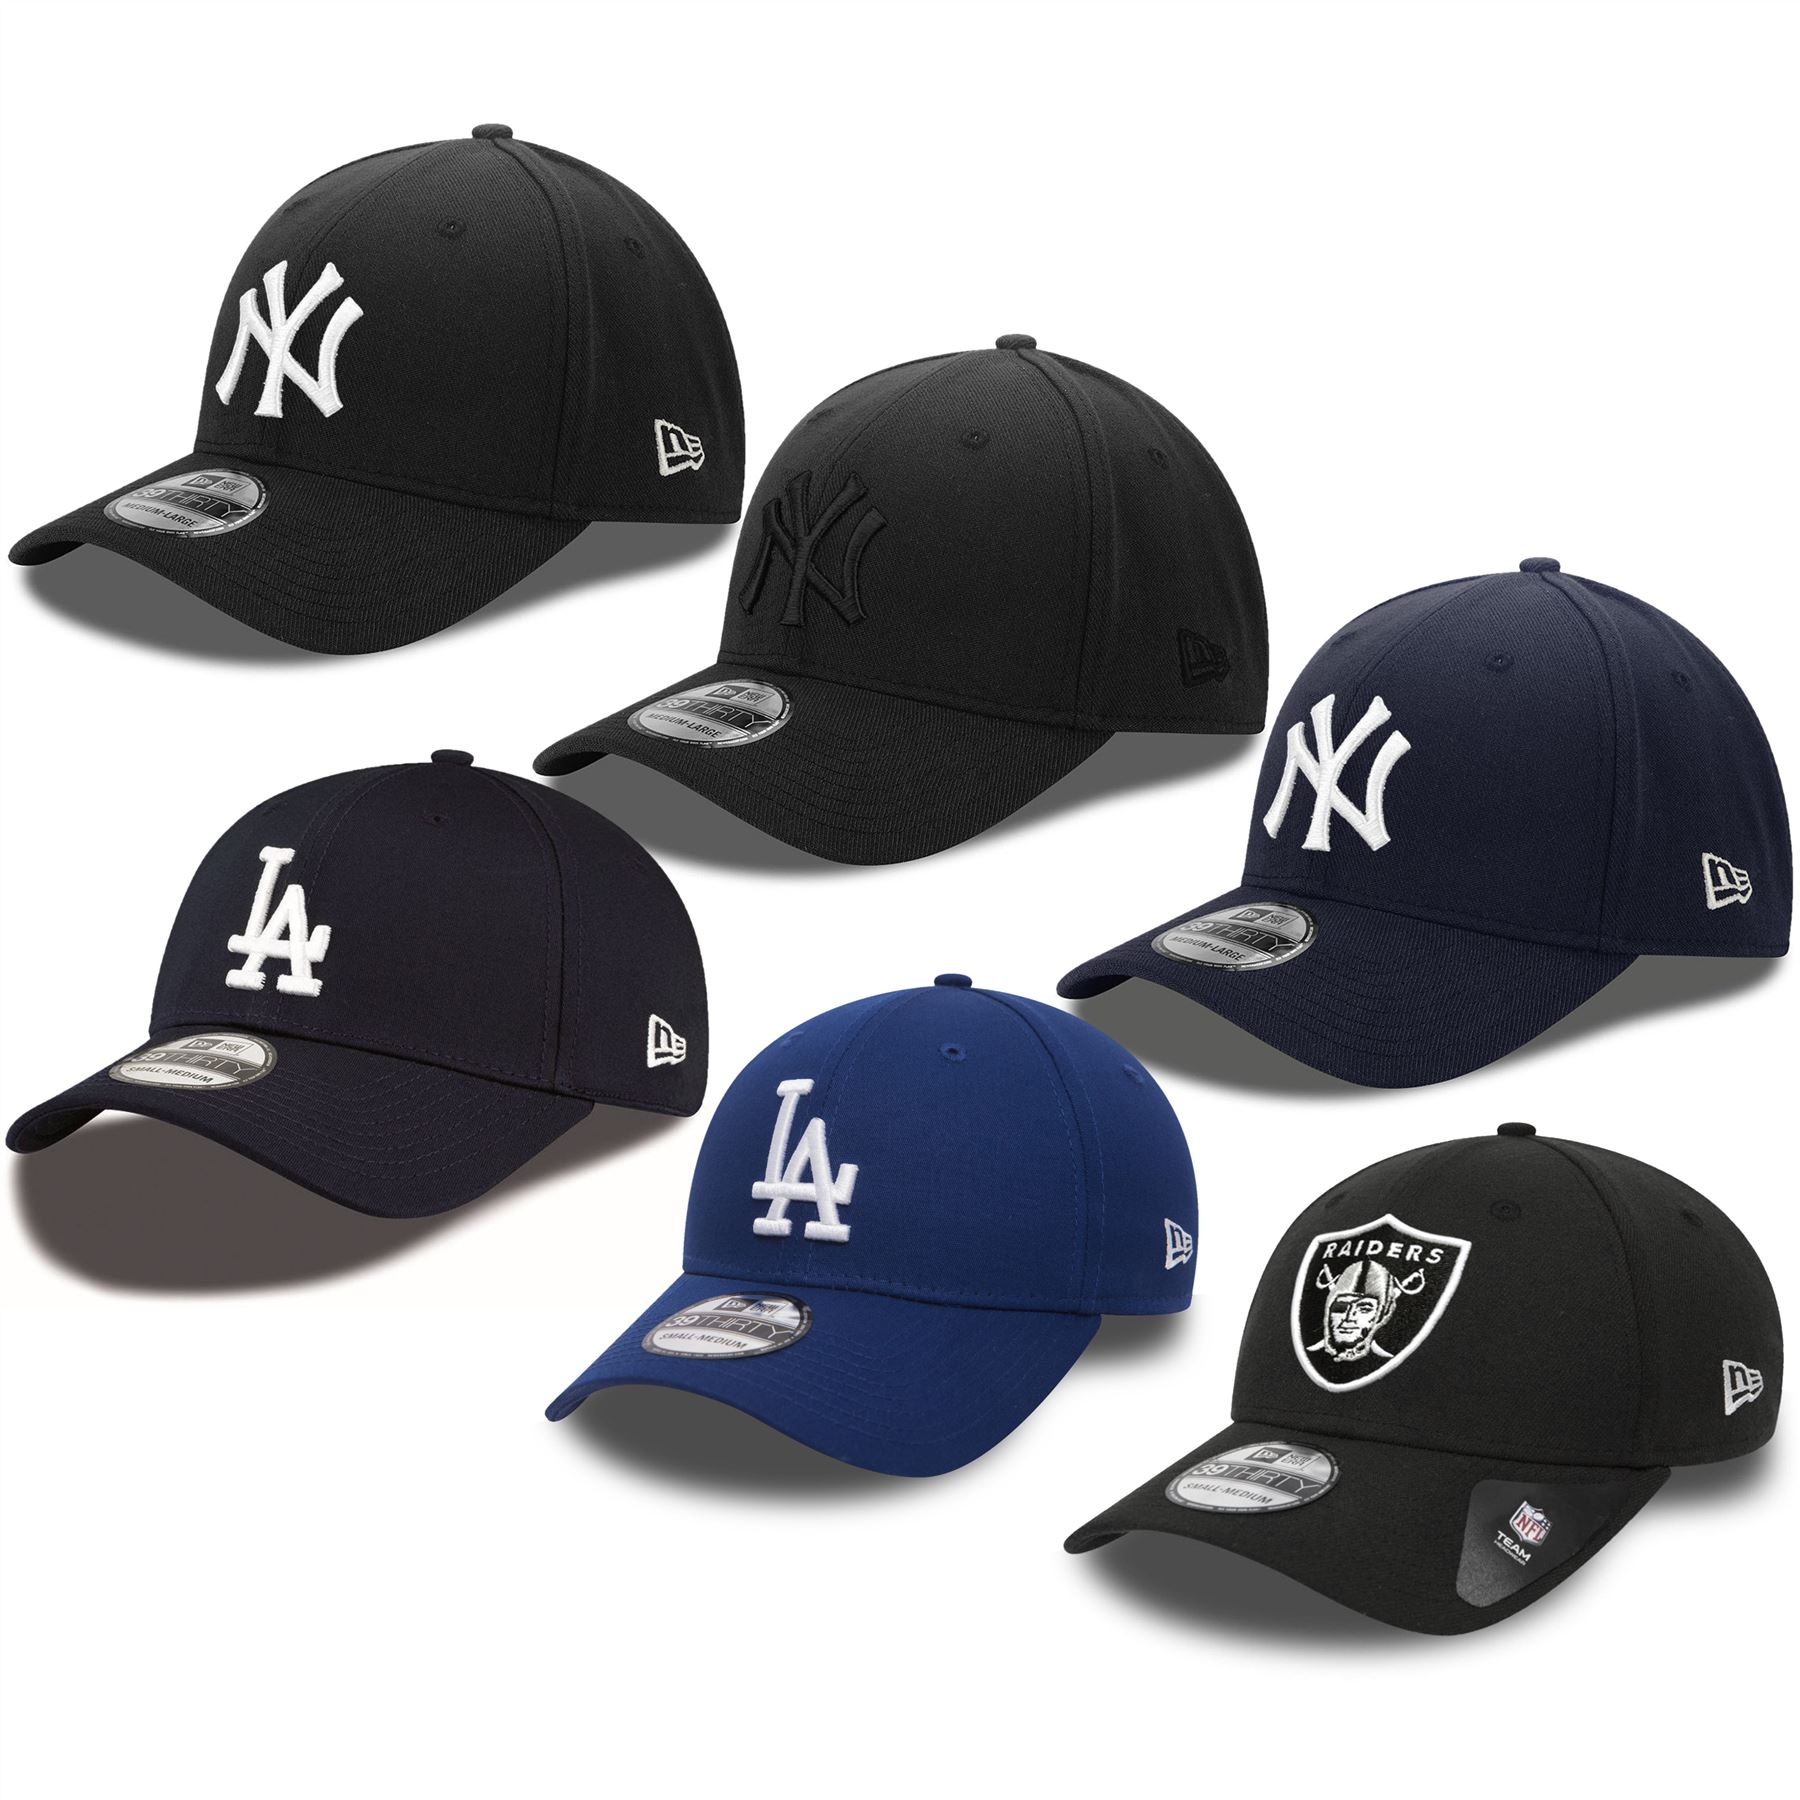 18ebefedbc8b Details about New Era 39THIRTY Yankees, Dodgers, Raiders Classic Baseball  Cap - Black, Blue